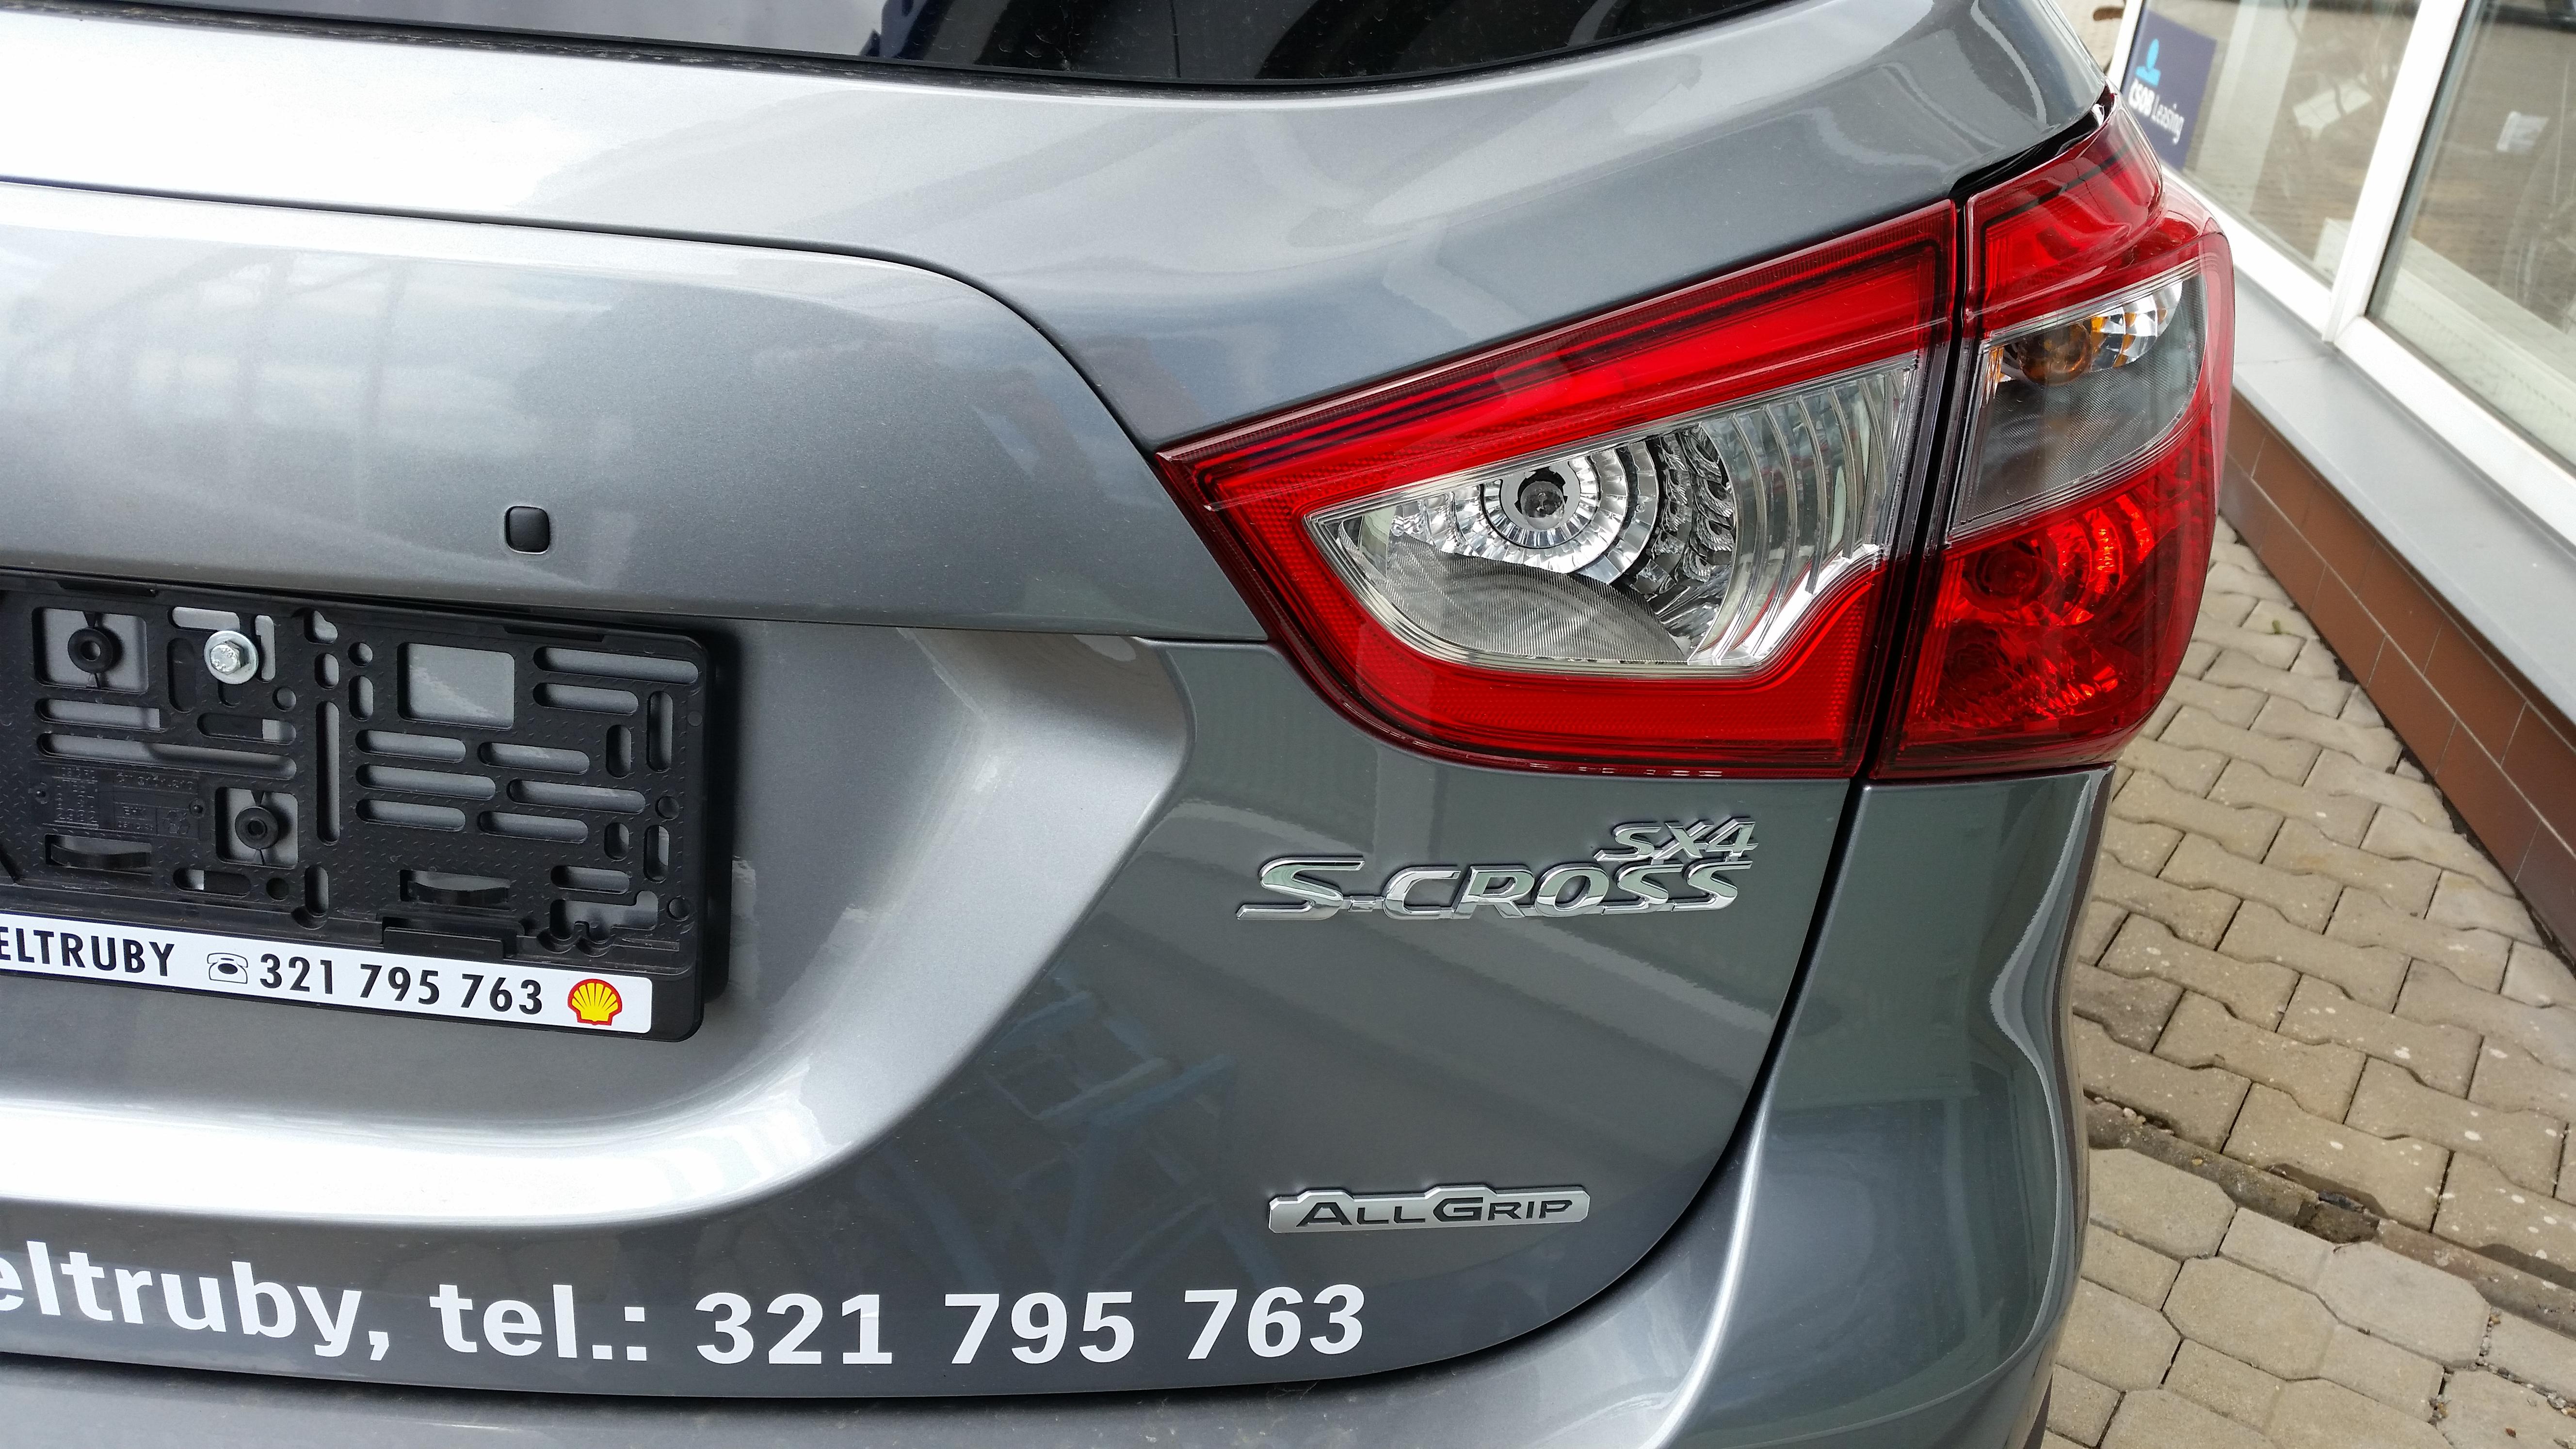 Suzuki S-cross 4x4